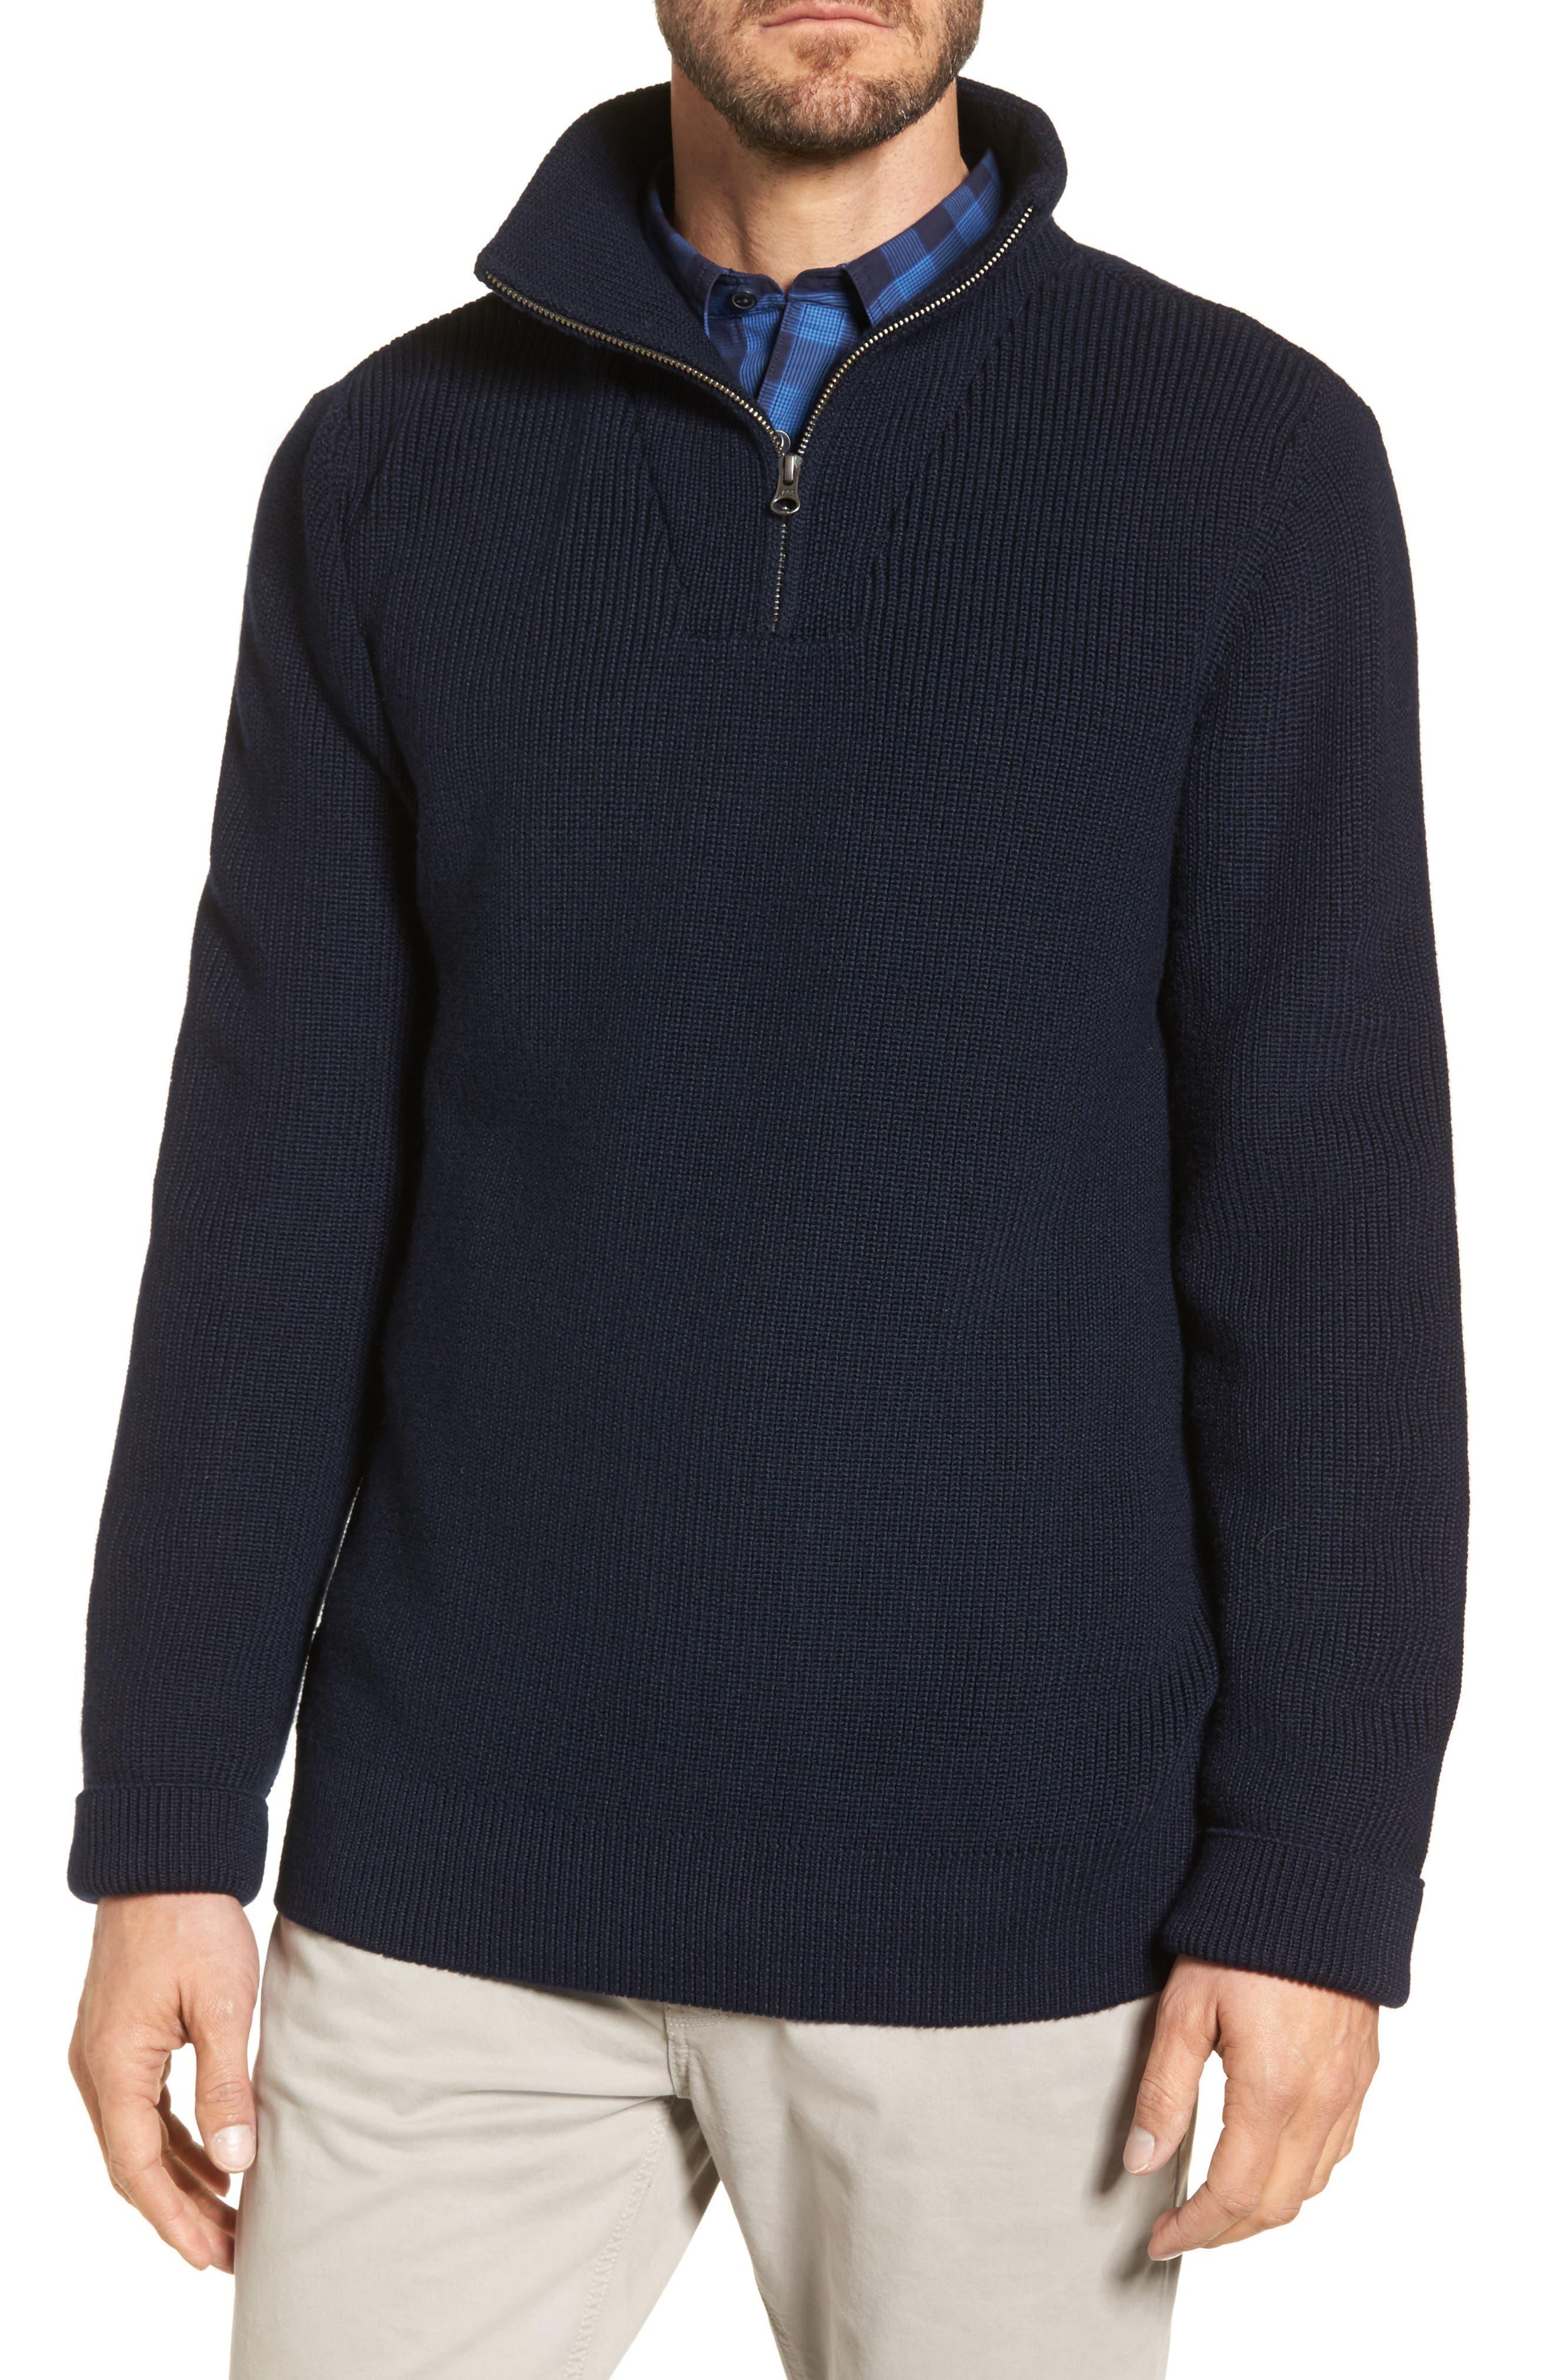 Main Image - Nordstrom Men's Shop Ribbed Quarter Zip Sweater